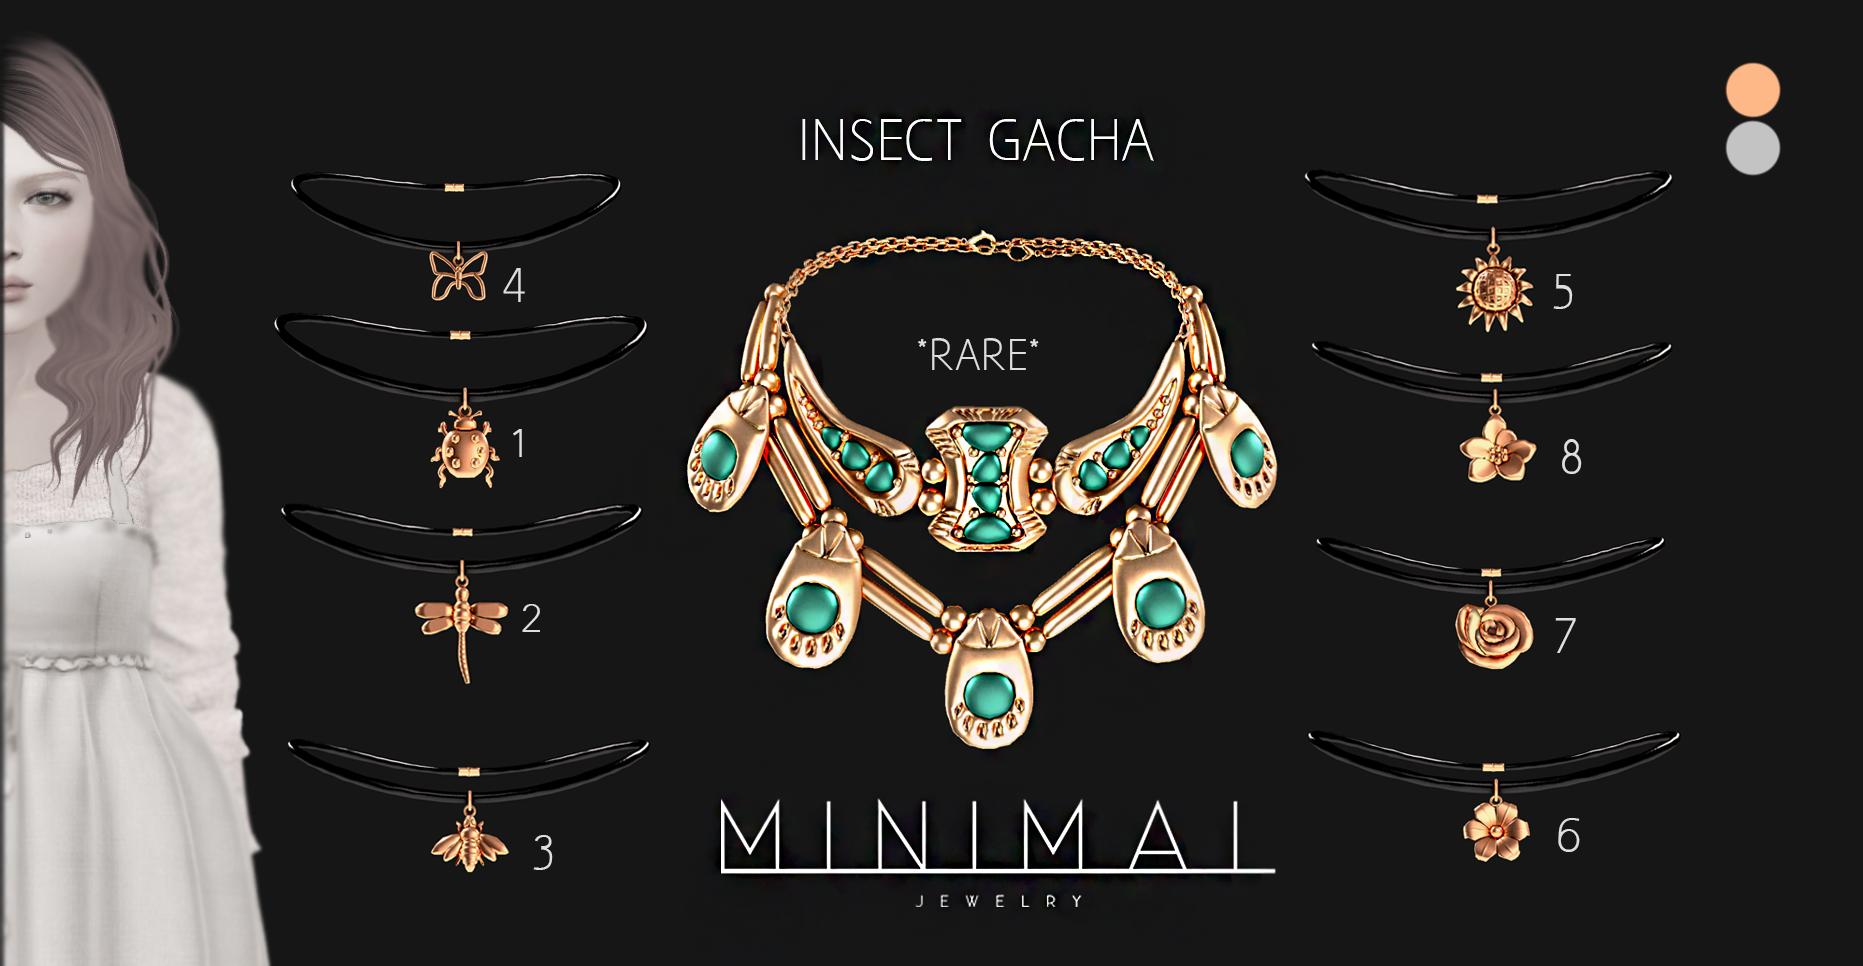 MINIMAL - INSECT GACHA.png